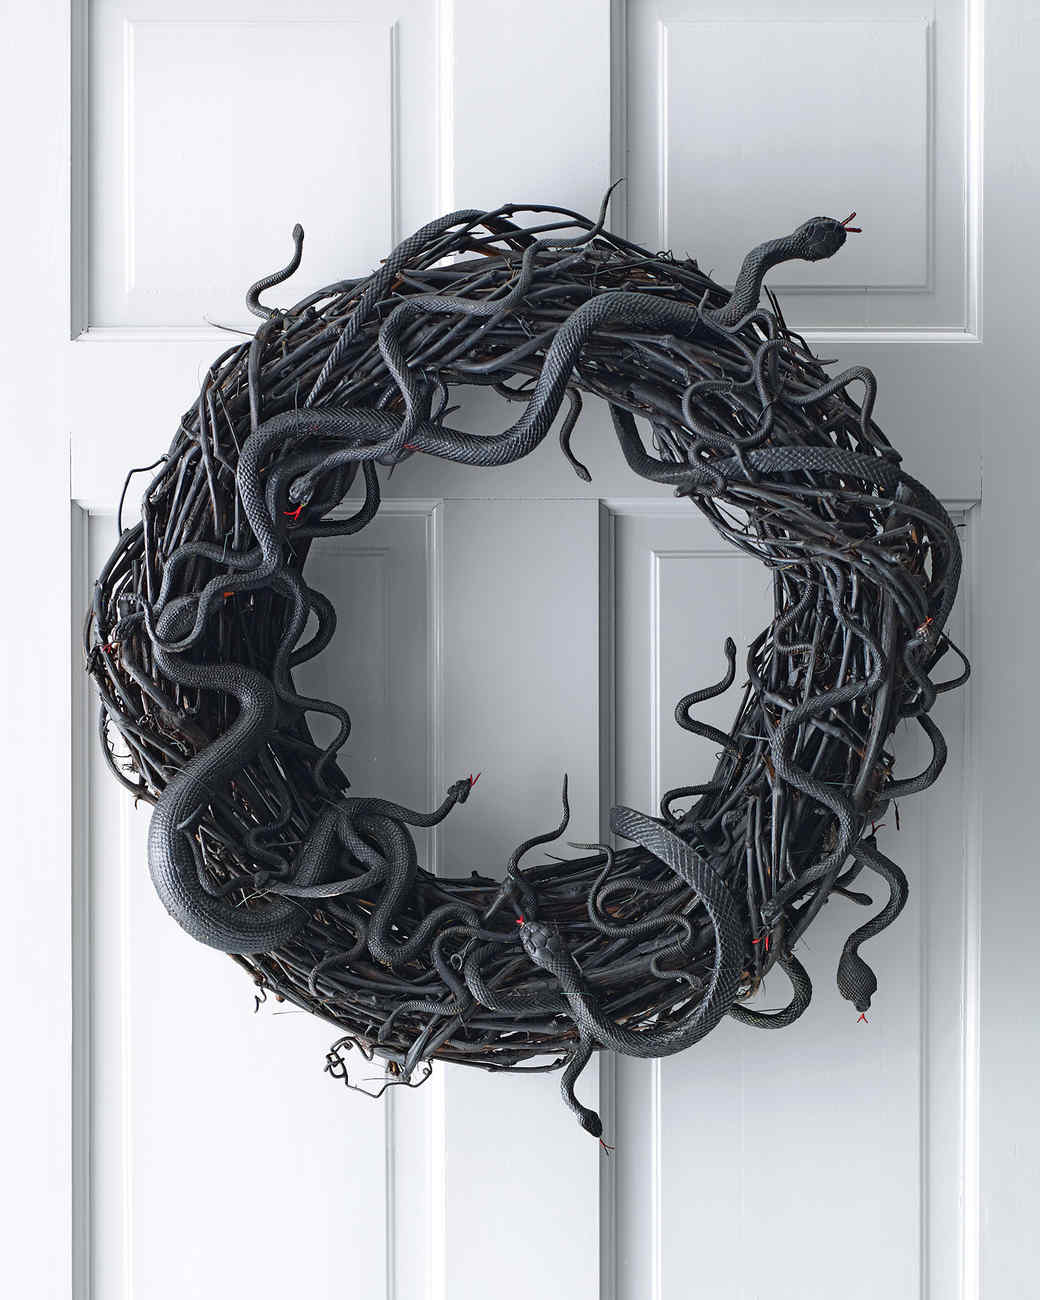 Wriggling Snake Wreath